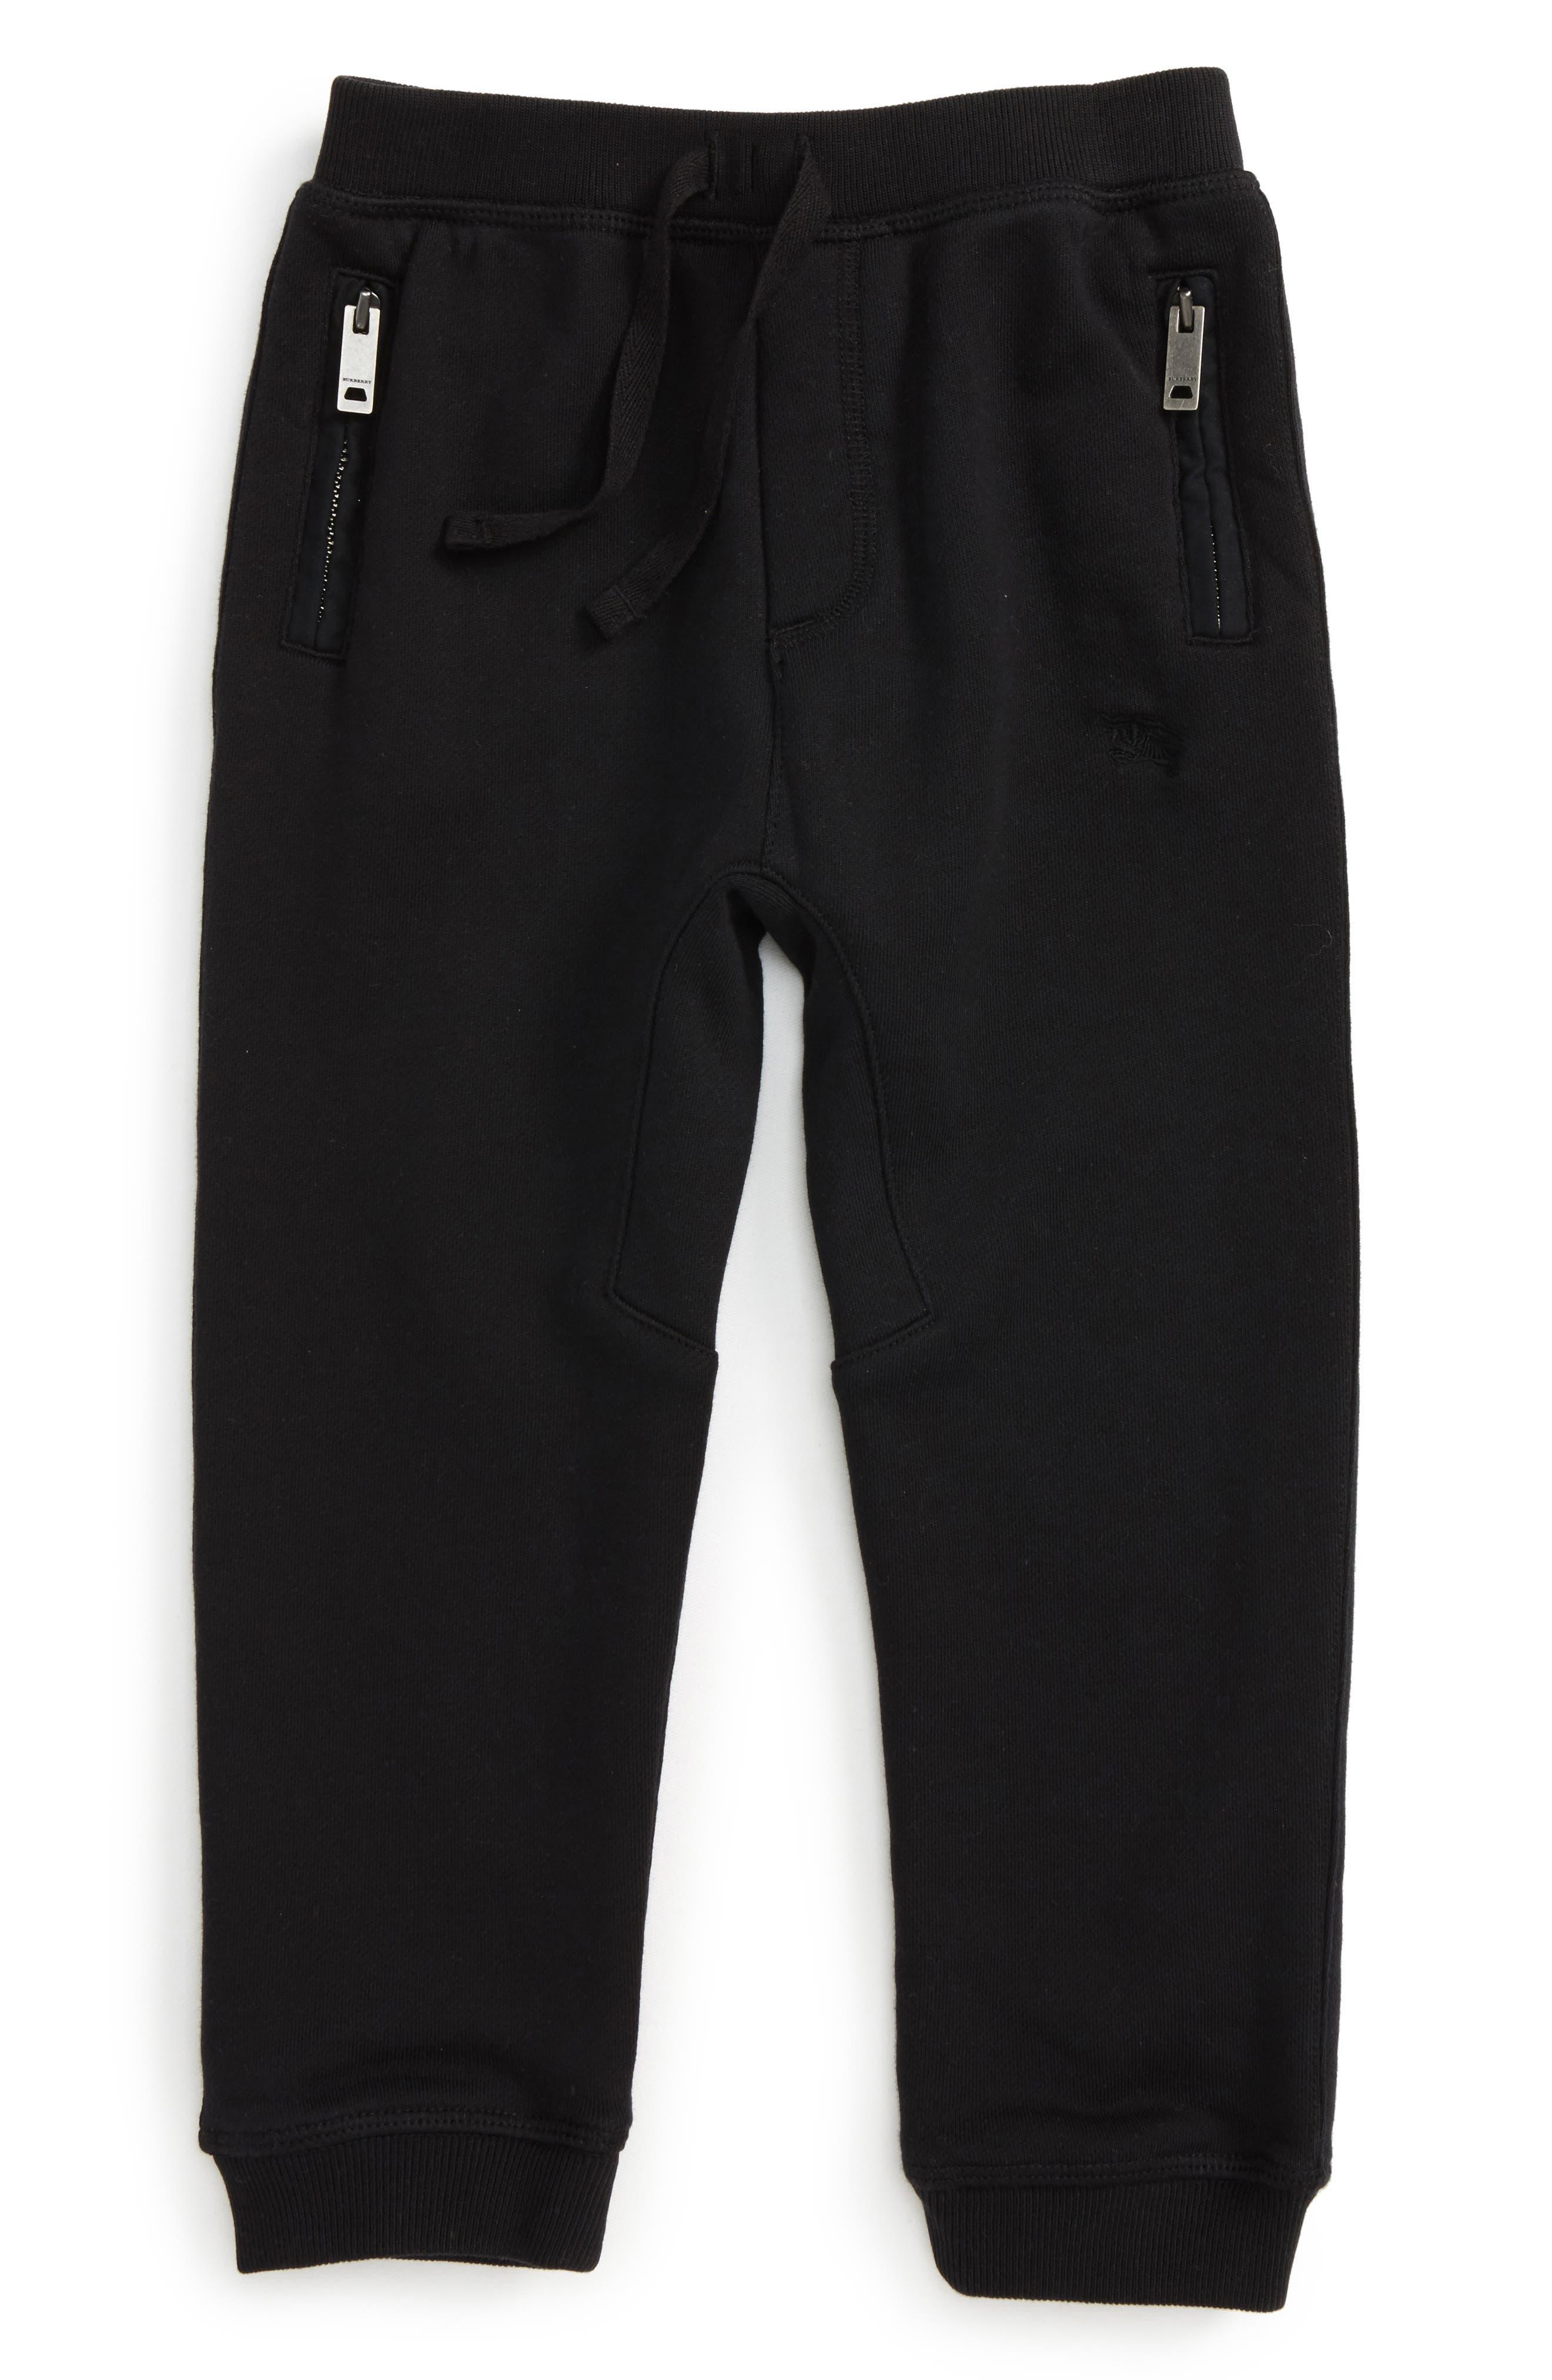 Burberry 'Mini Phill' Sweatpants (Baby Boys)